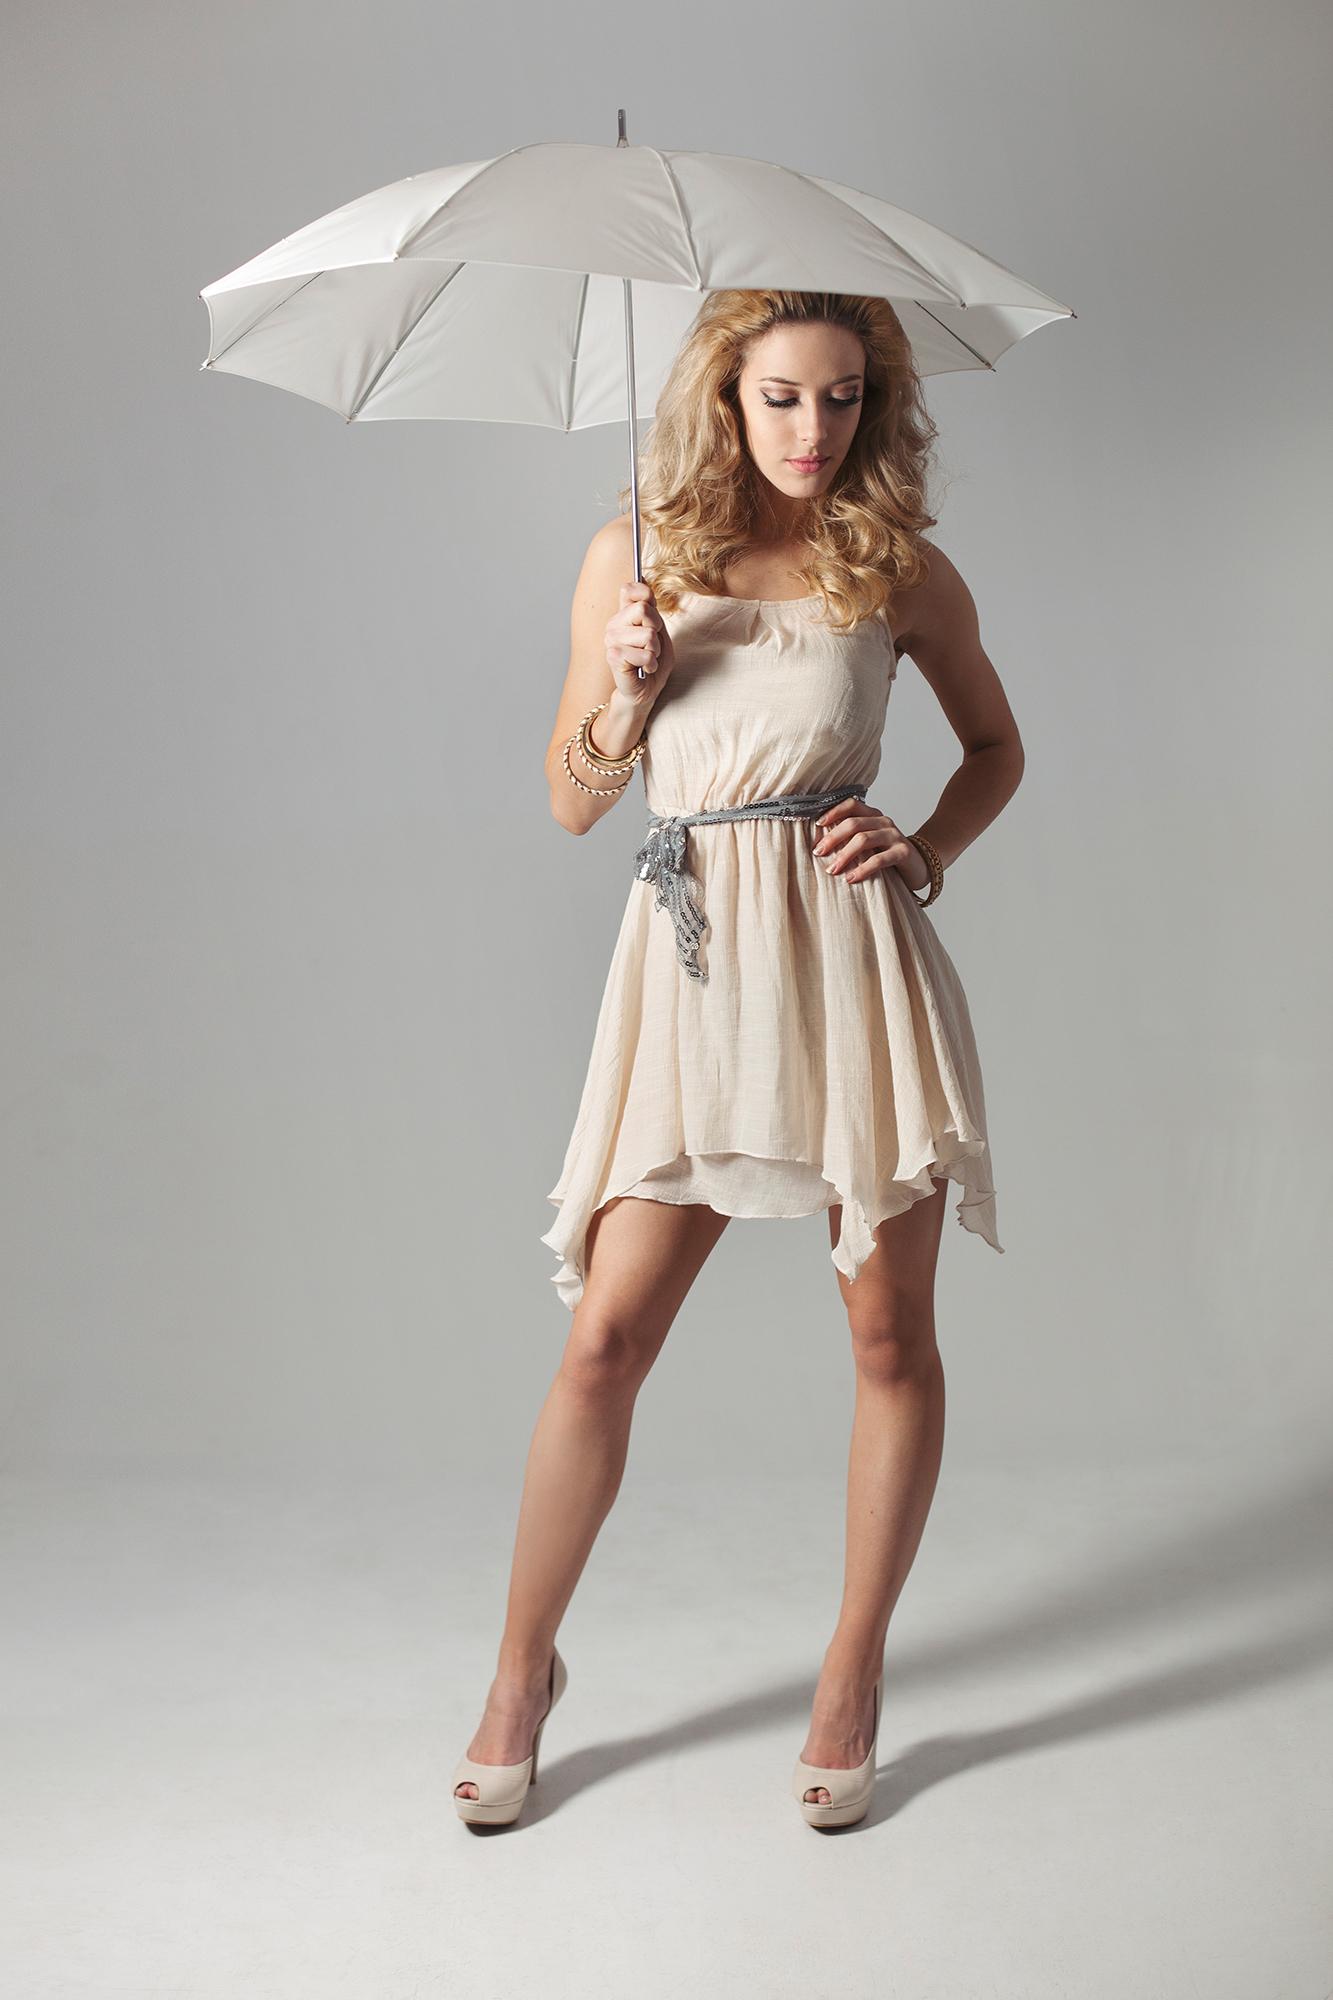 Model with an umbrella - Fashion